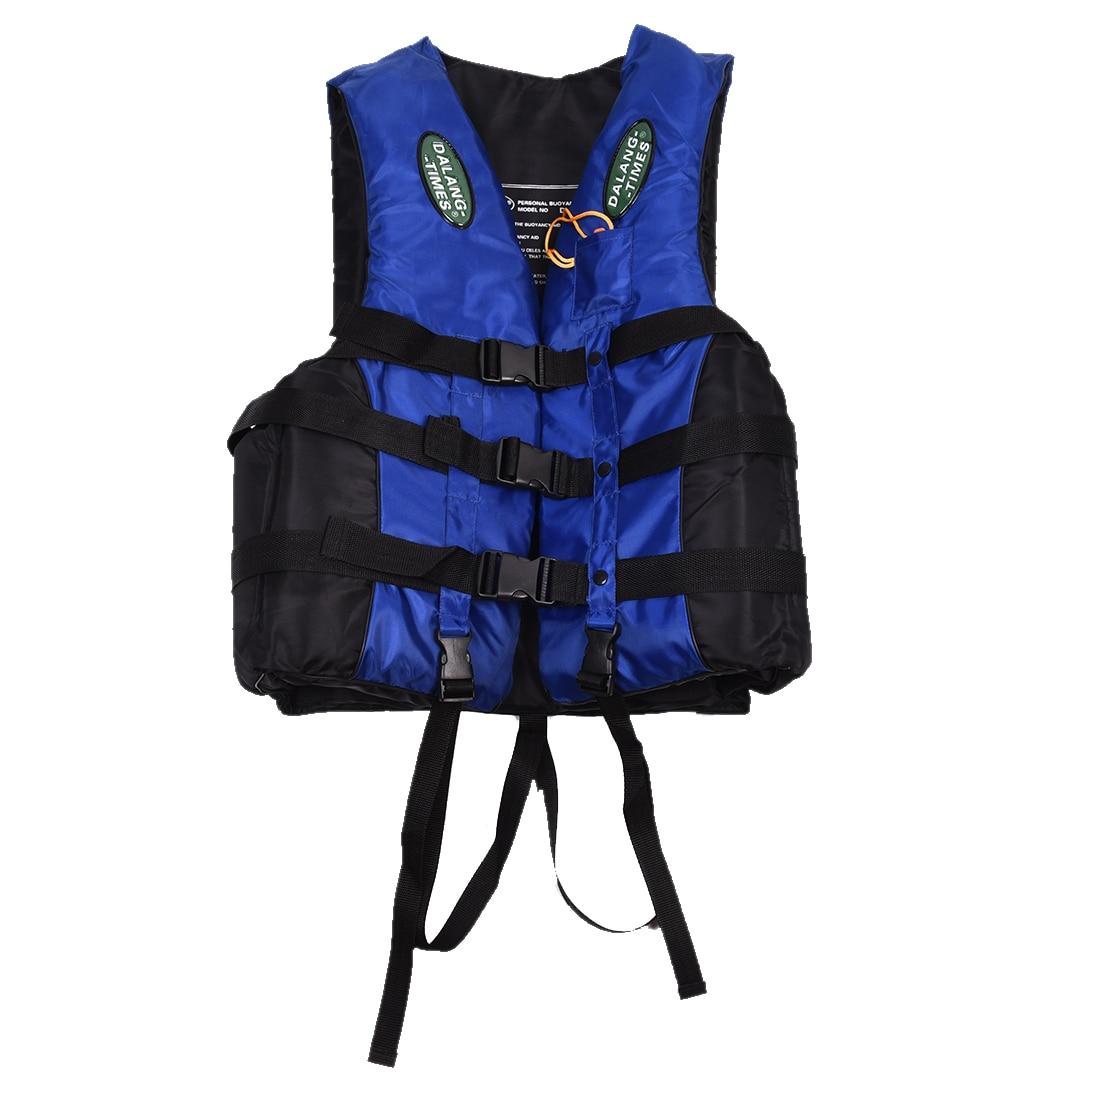 Dalang Times Boating Ski Vest Adult PFD Fully Enclosed Size Adult Life Jacket